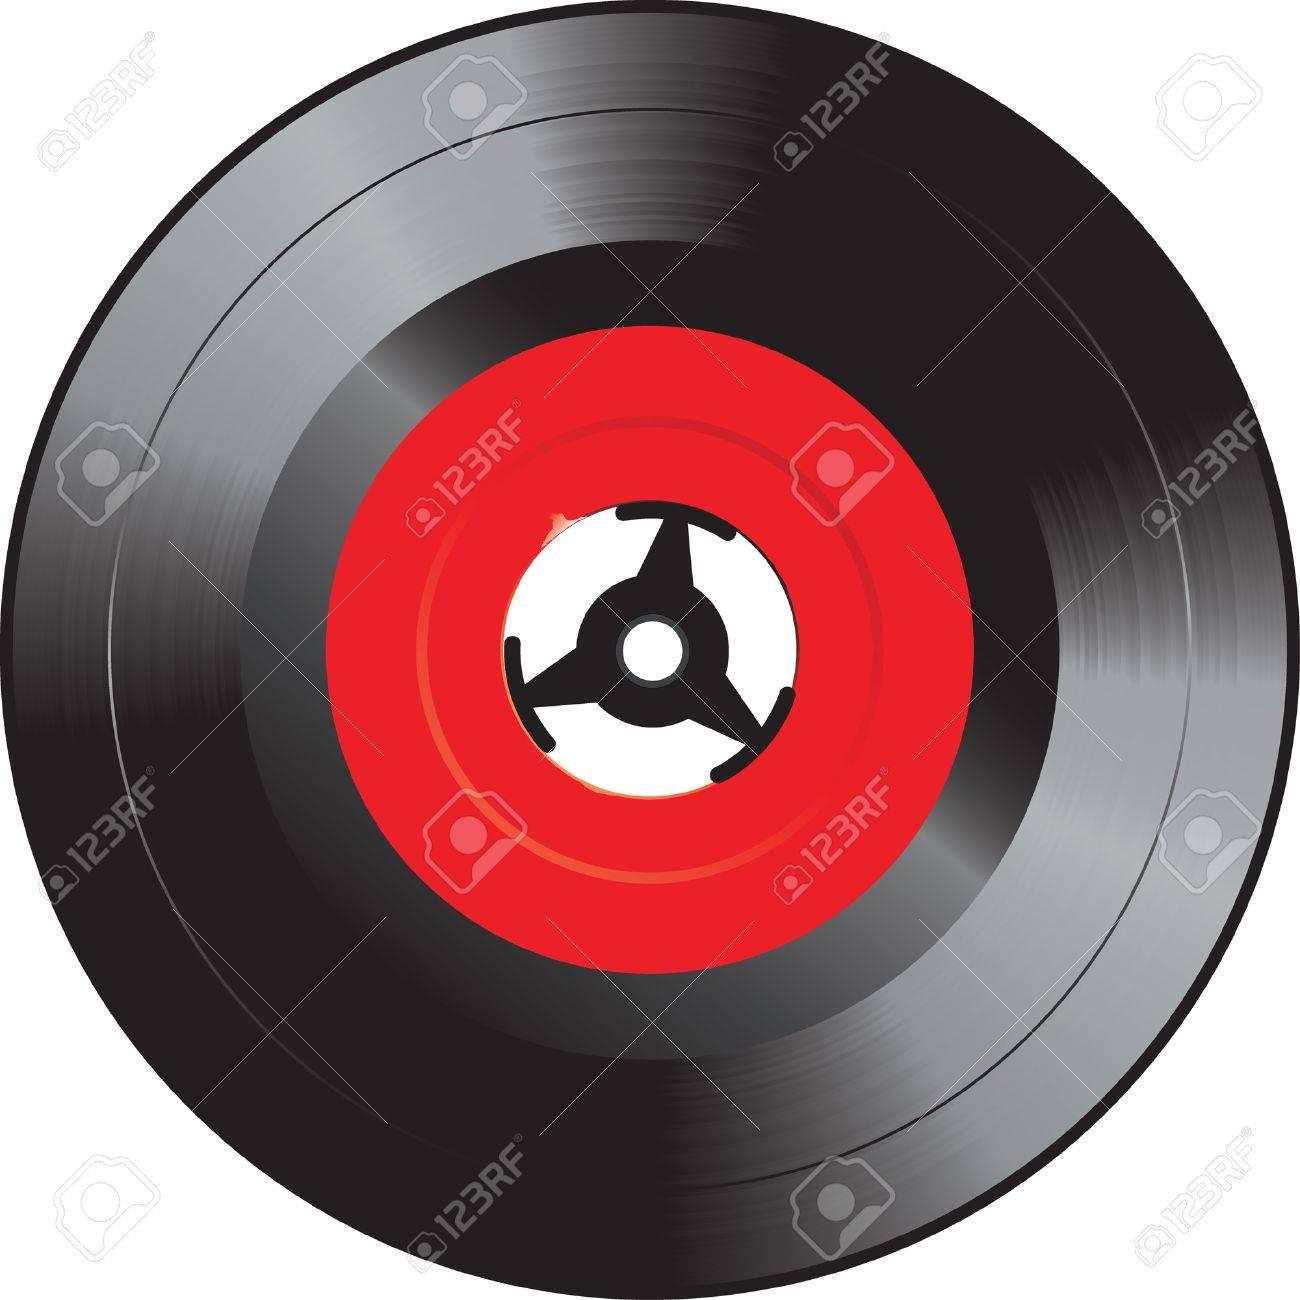 Nieuw Vector Illustration Of The Single Vinyl Record Royalty Free EQ-72